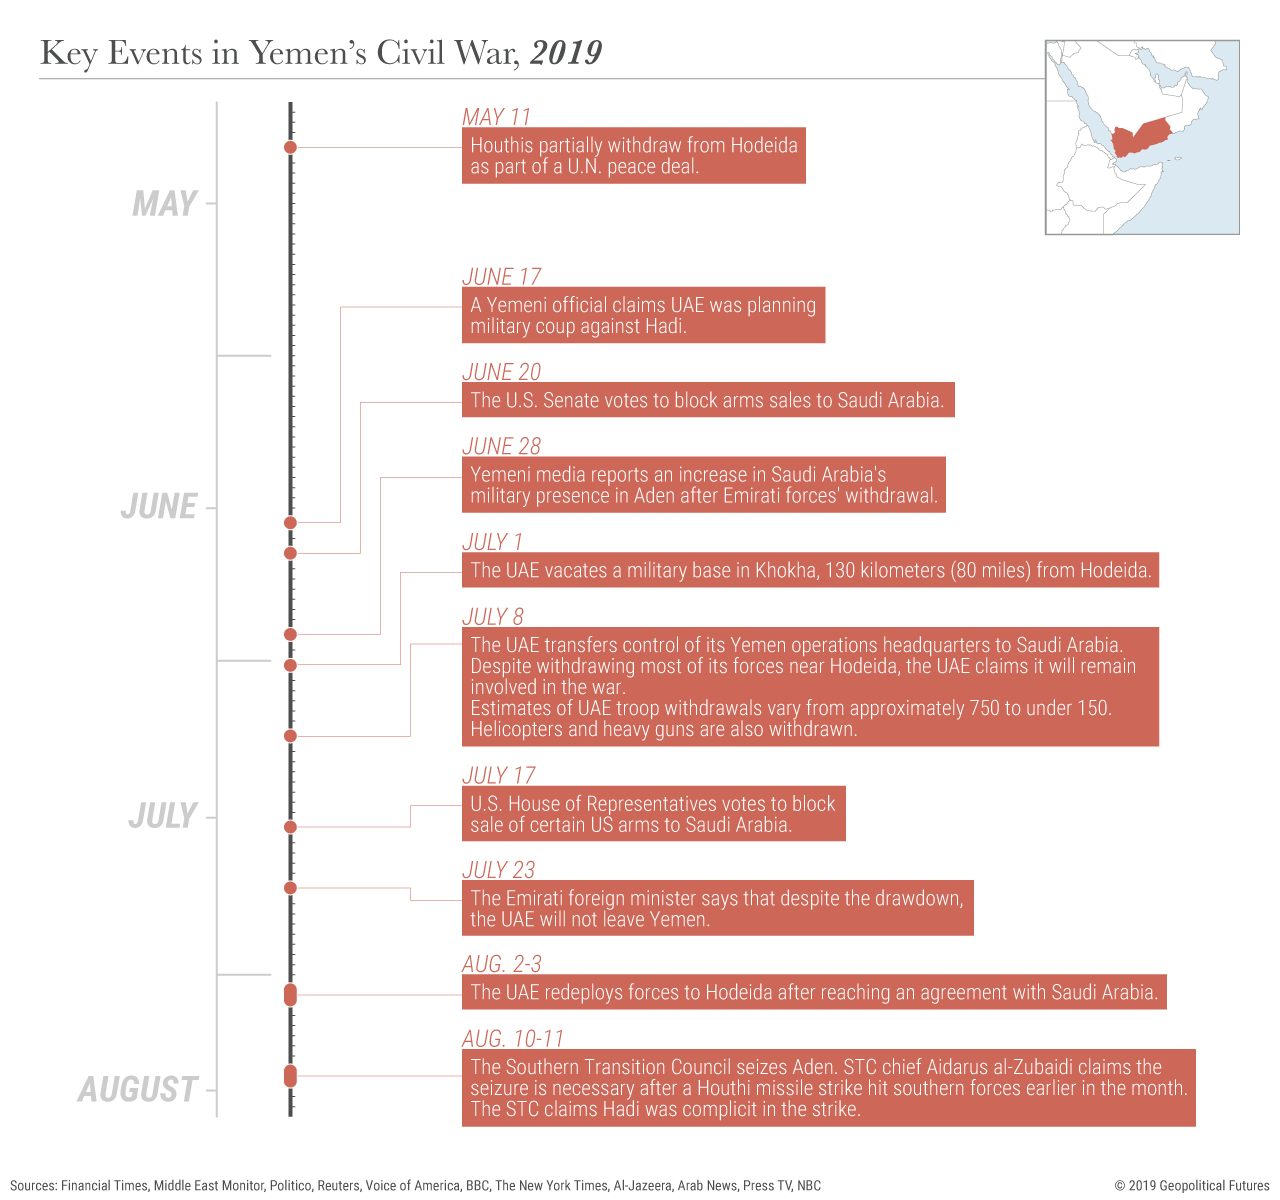 Key Events in Yemen's Civil War, 2019